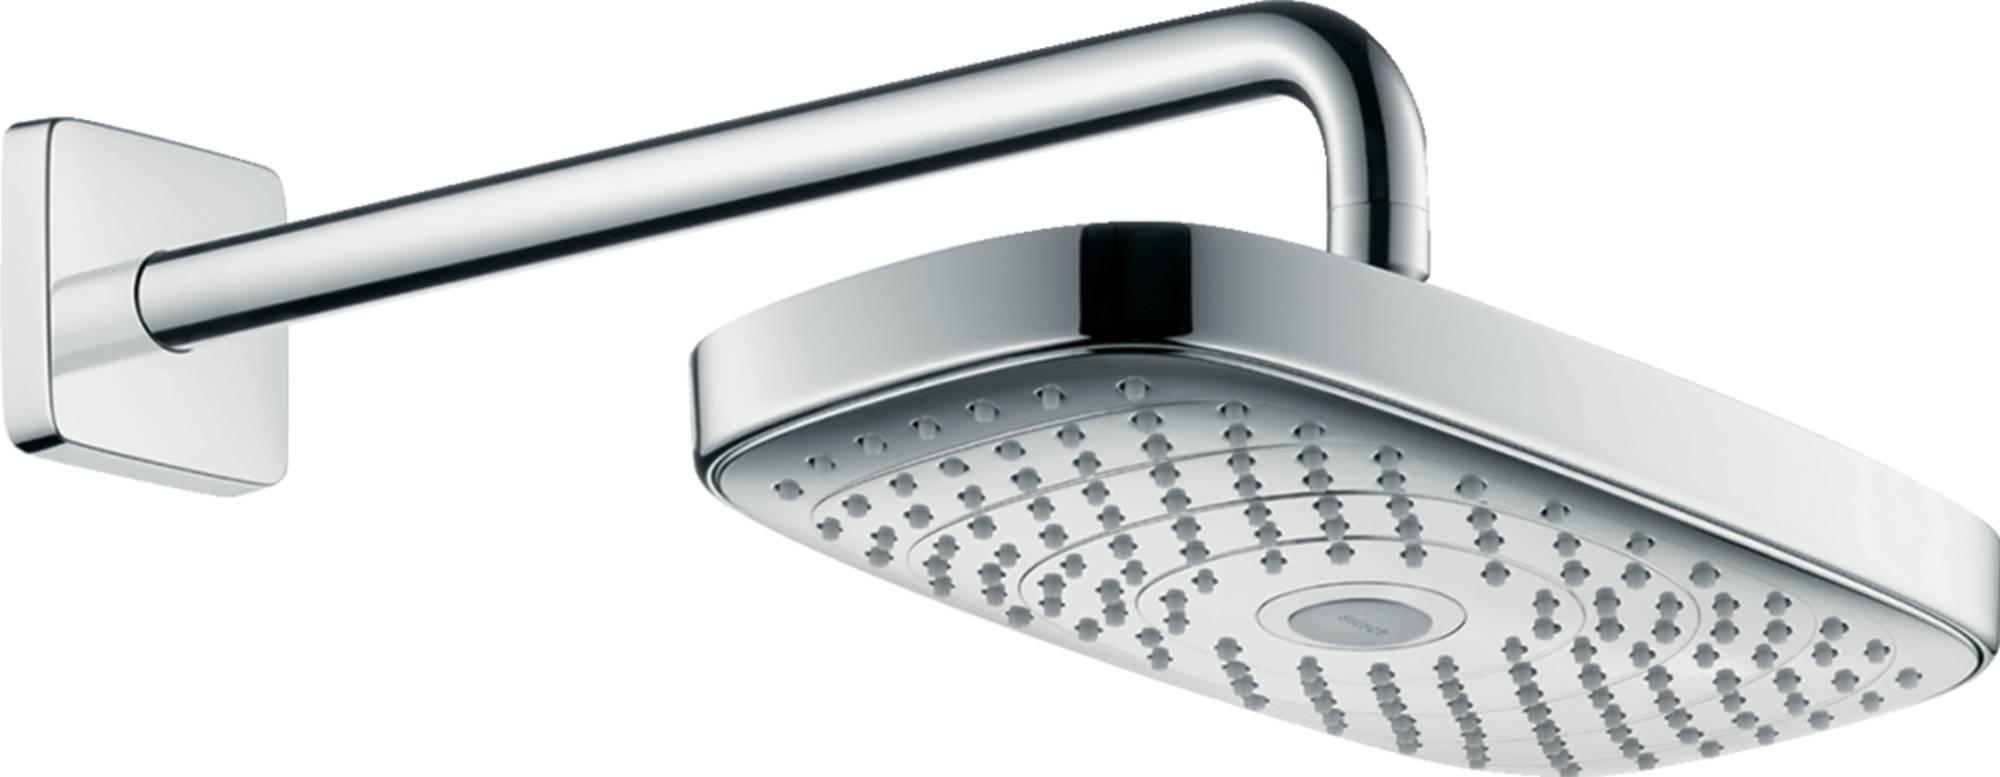 Hansgrohe Raindance Select E 300 2jet hoofddouche douchearm Chroom